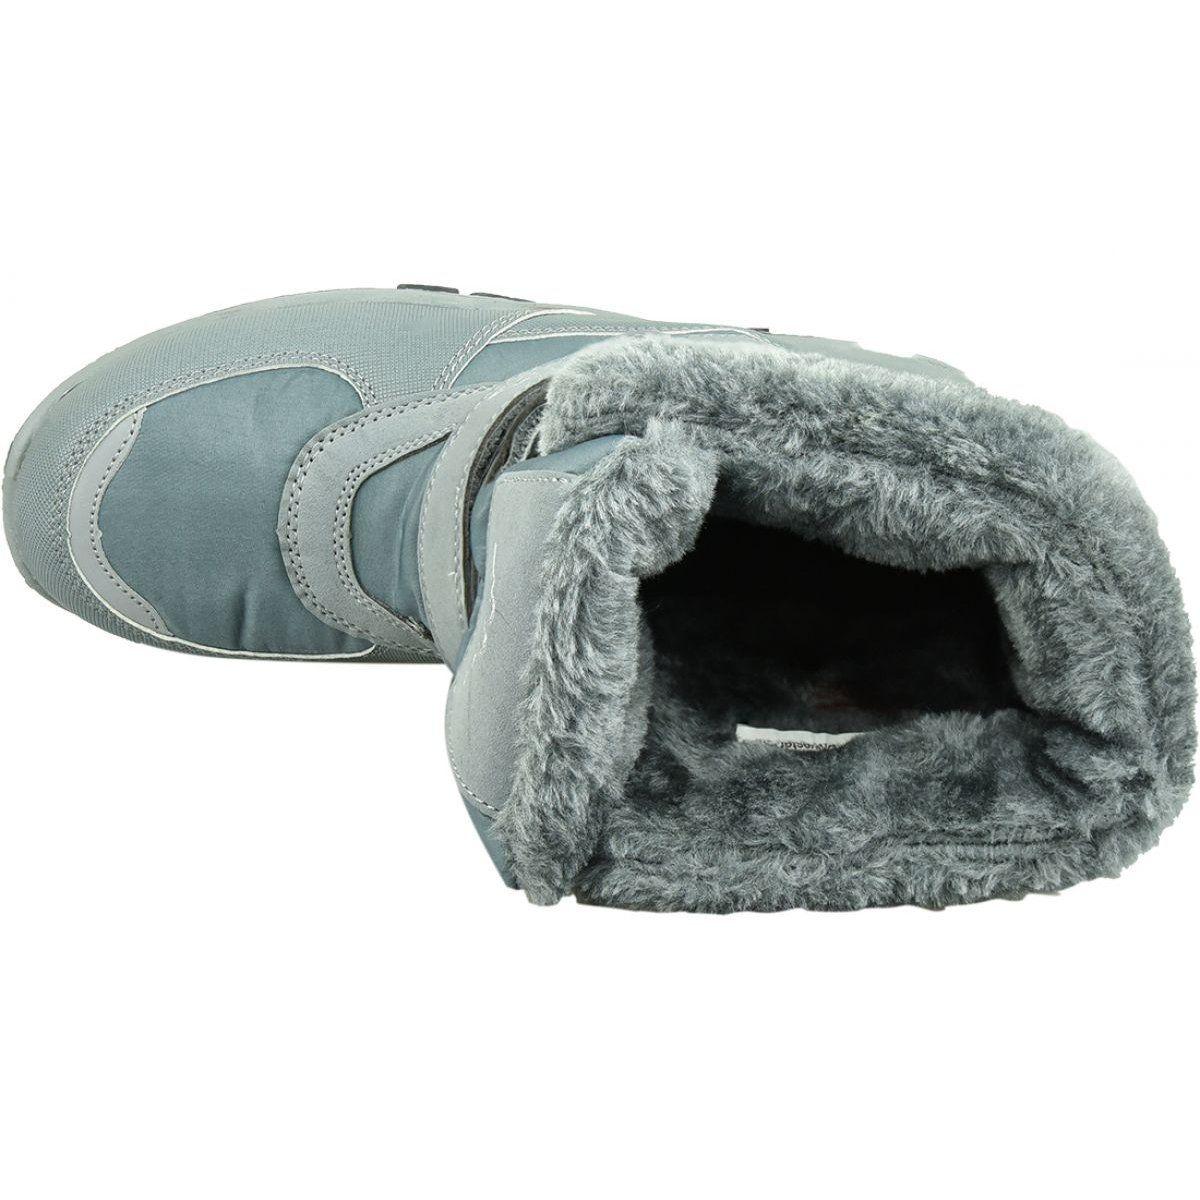 Buty Sportowe Dzieciece Dla Dzieci Innamarka Buty Zimowe Kappa Gurli Tex Jr 260728t 1615 Szare Winter Boots Girls Winter Boots Kid Shoes